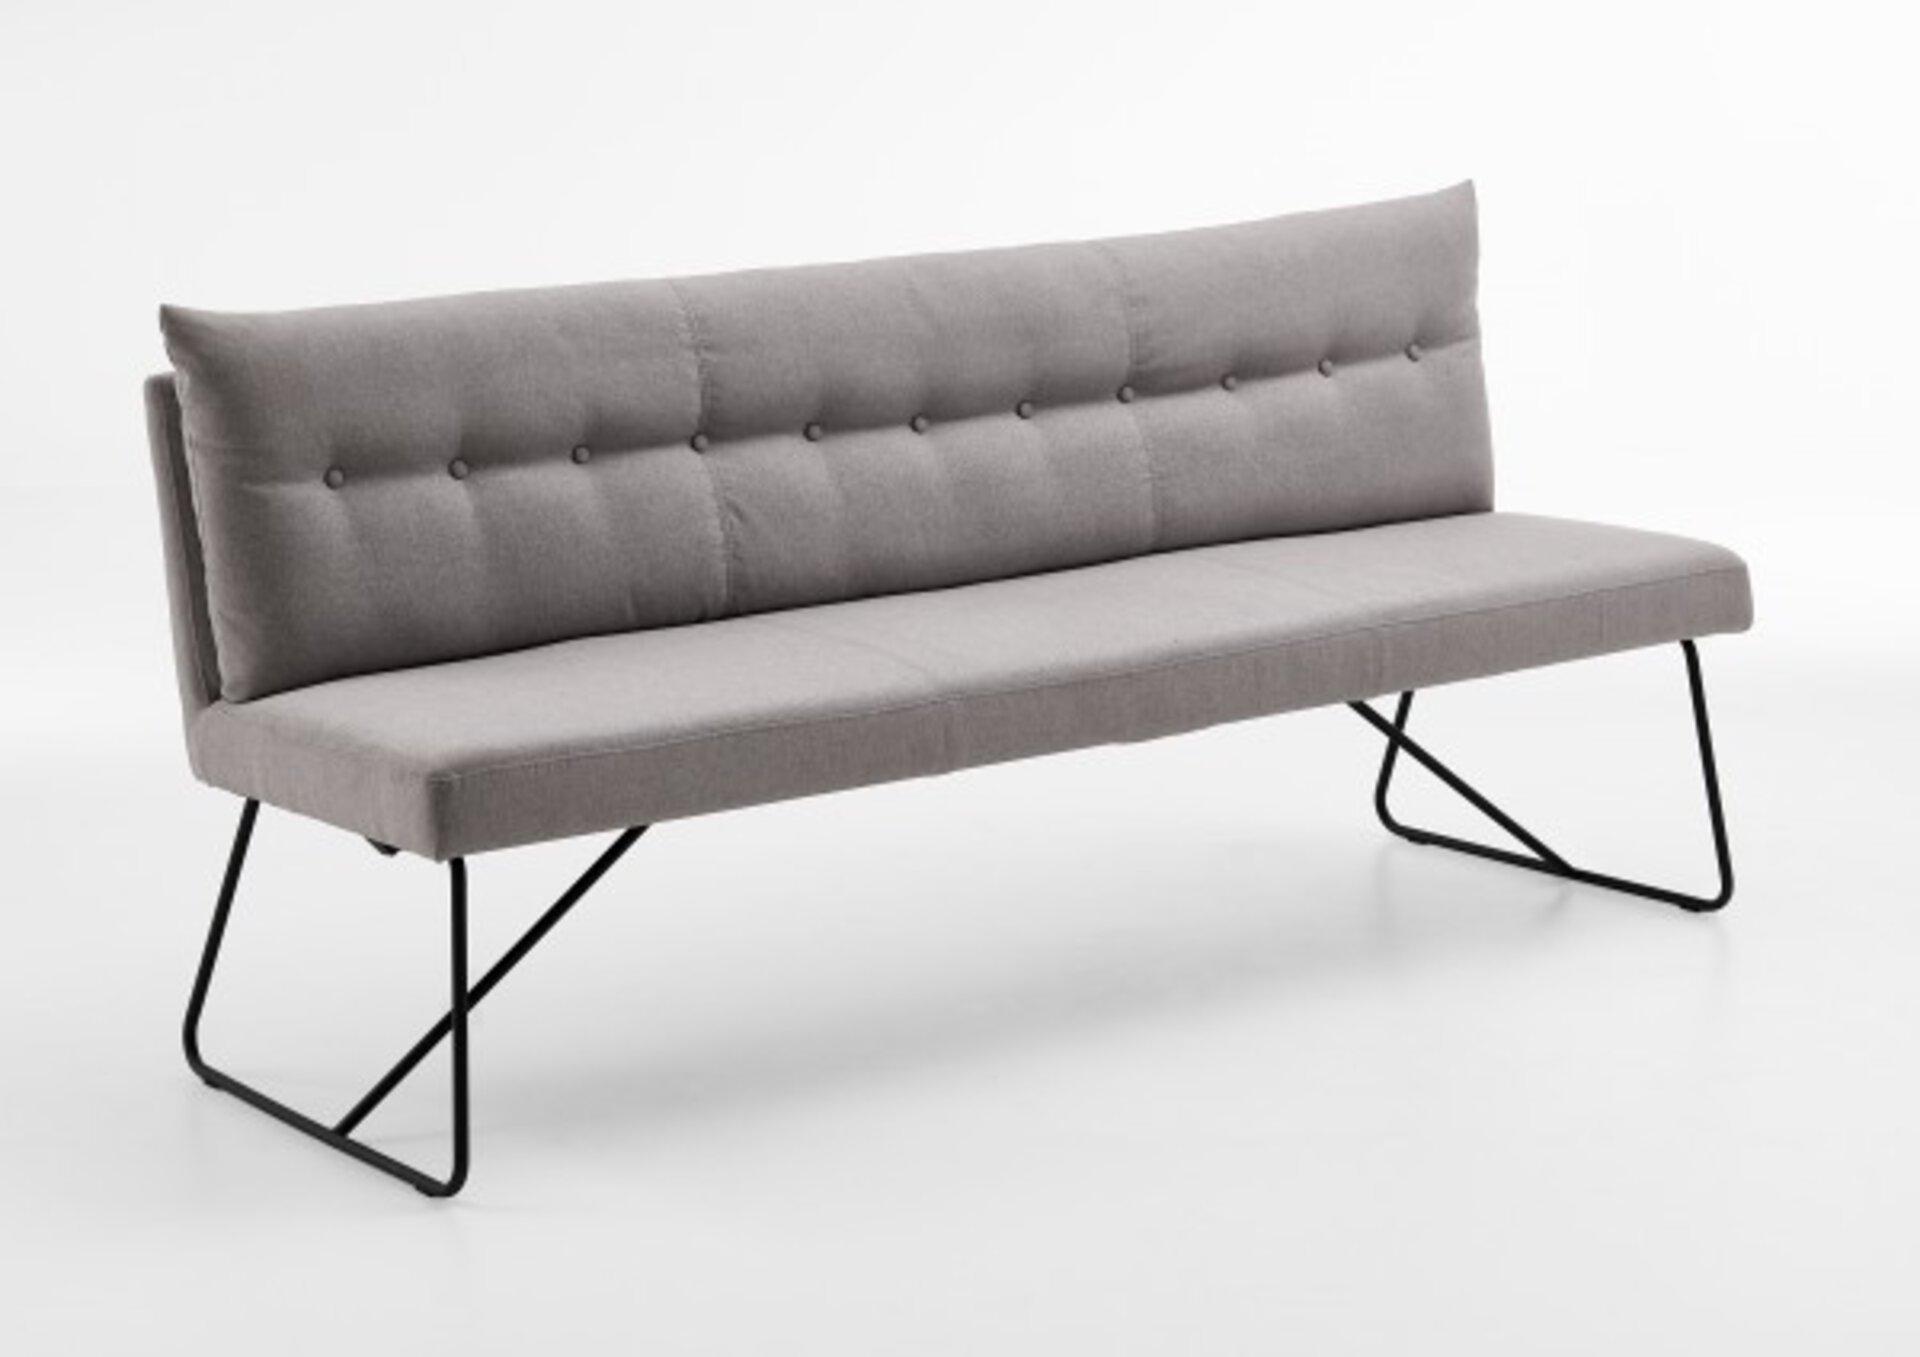 Sitzbank NUBUS VALMONDO Textil 63 x 90 x 180 cm